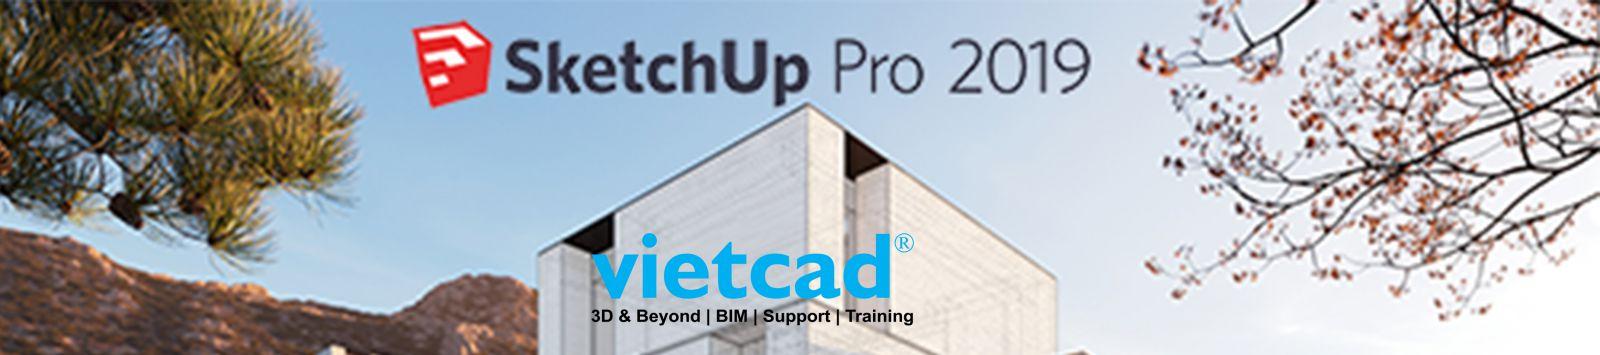 Phan mem SketchUp Pro 2019 - VietCAD